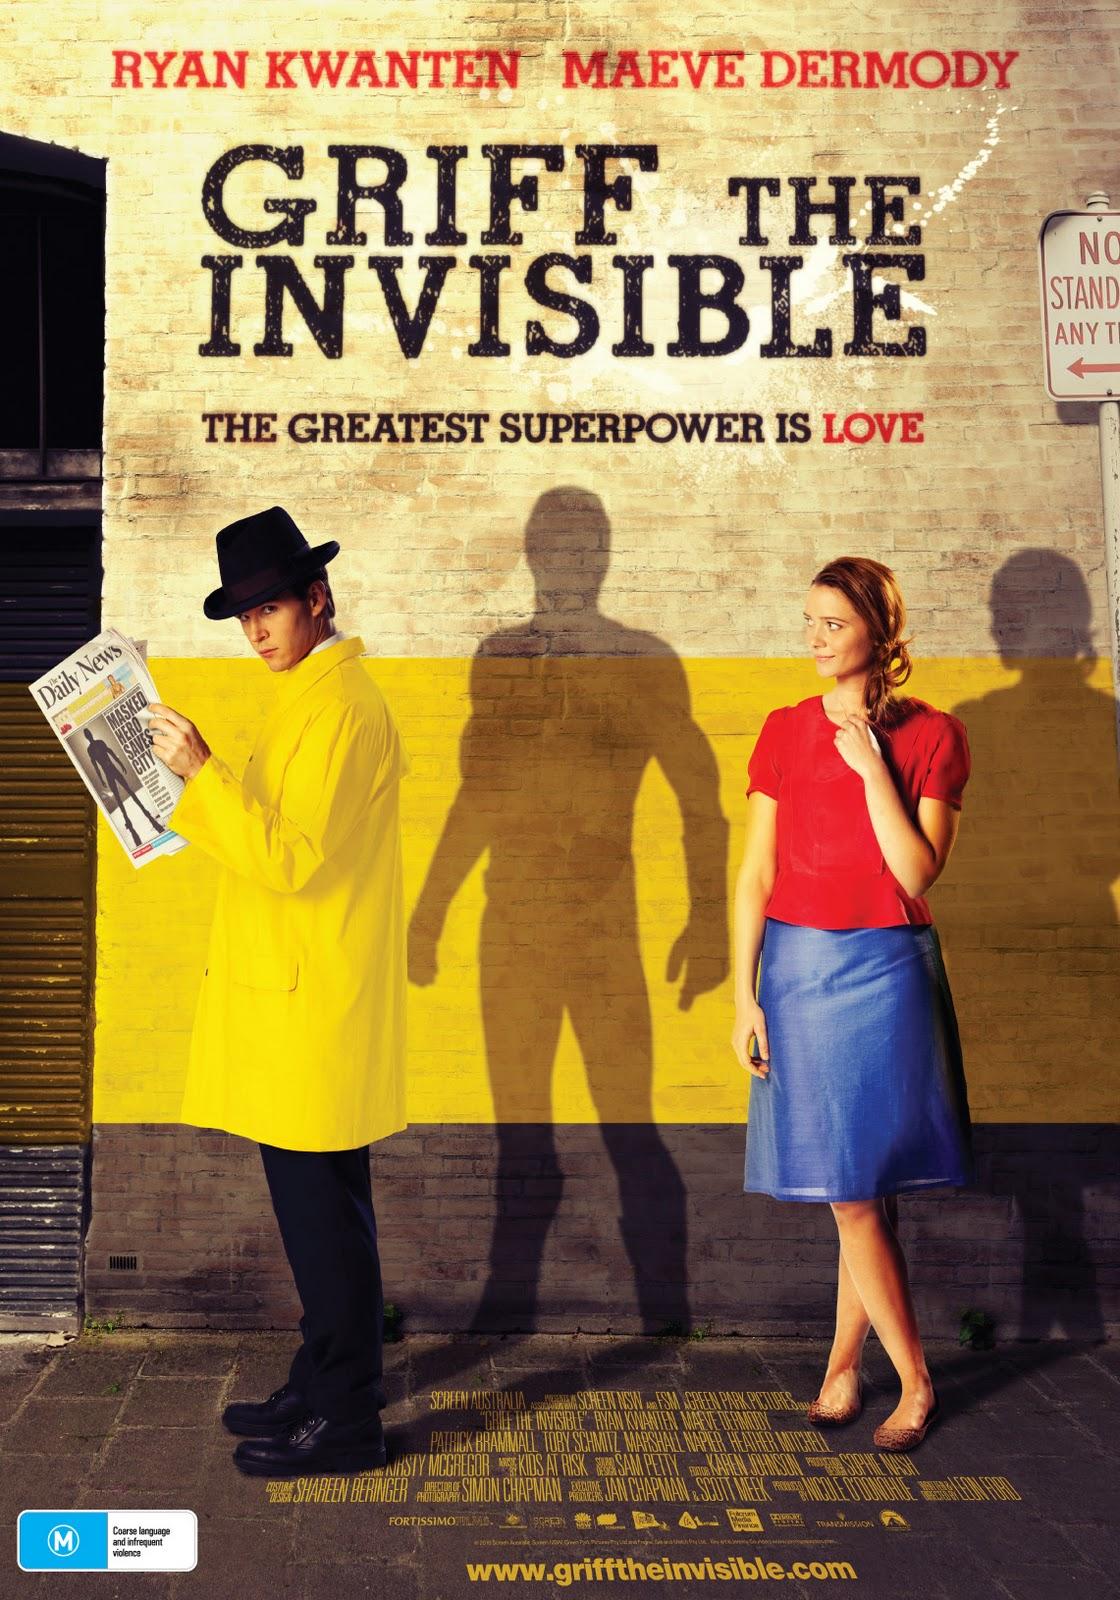 http://3.bp.blogspot.com/_90MwaSsW-IU/TUOCnkoV_CI/AAAAAAAACfA/7Y4tUbwY7_U/s1600/Griff-the-invisible_poster.jpg